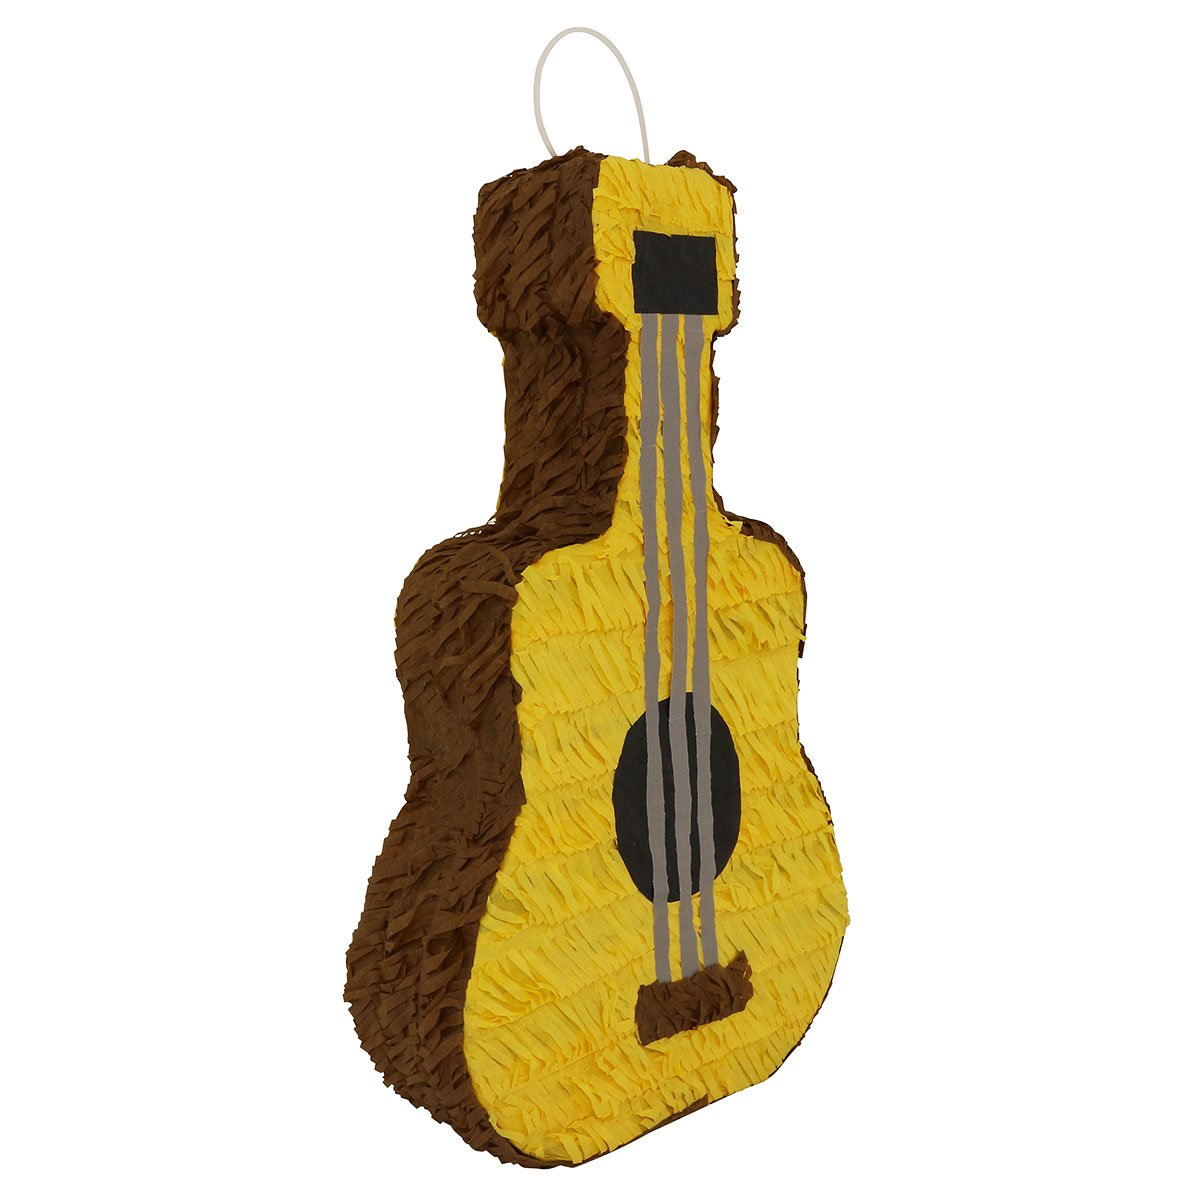 Lutema Acoustic Guitar Pinata Classic Mexican Guitarra Piñata Ideal - Mexican Party ideas